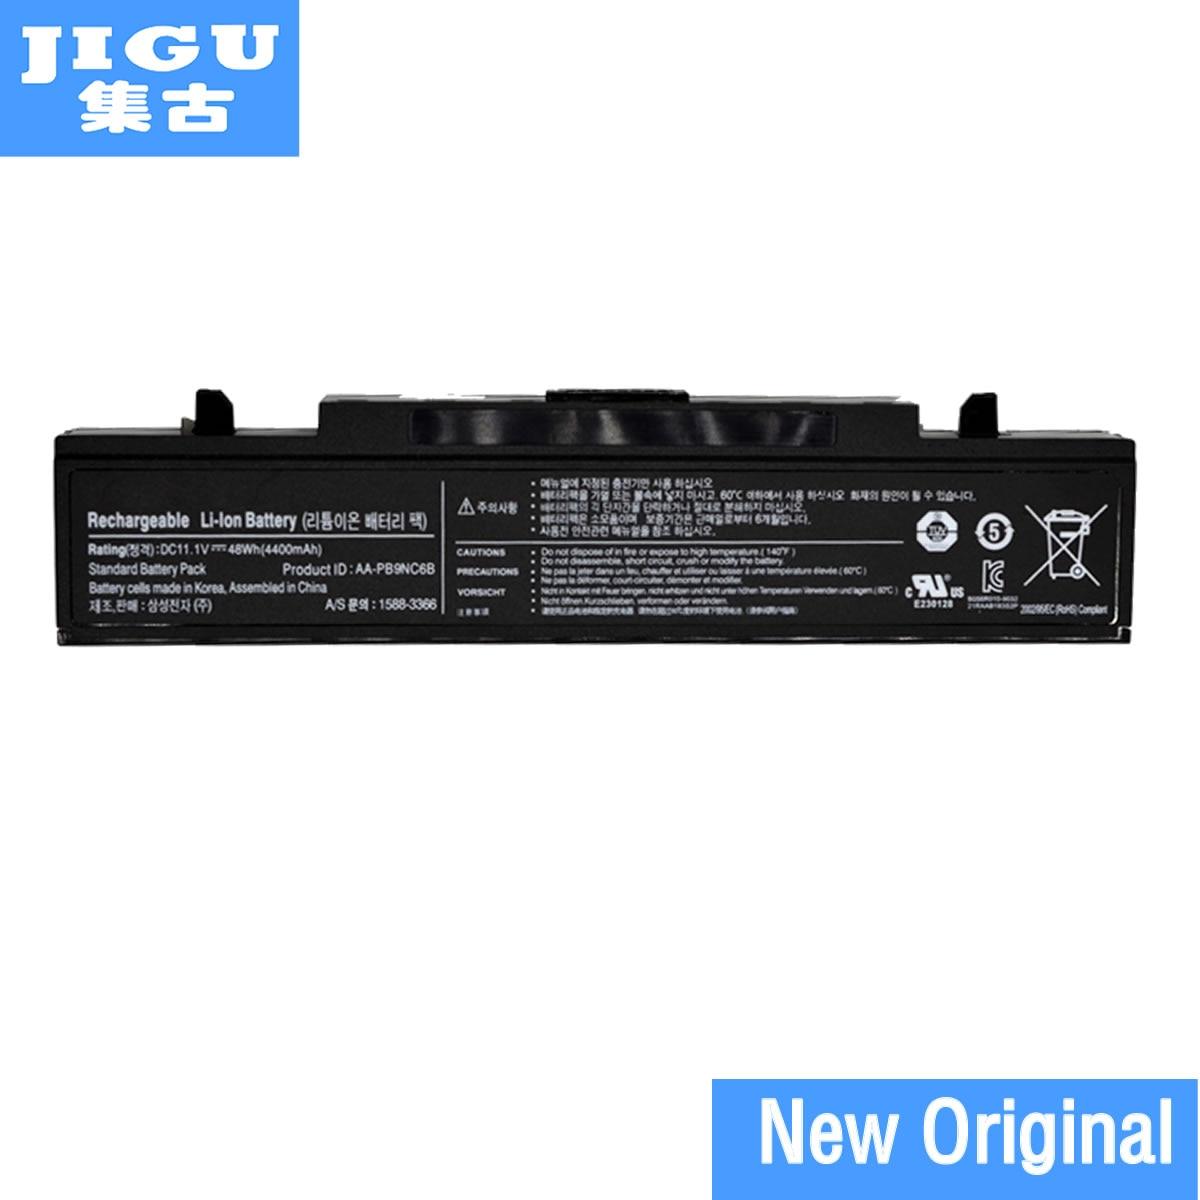 JIGU Original Laptop Battery For SAMSUNG R718 R720 R728 R730 R780 RC410 RC510 RC512 RC710 RC730 RF410 RF411 RF510 RF511 9 cell 7800mah laptop battery for samsung r718 r720 r728 r730 r780 rc410 rc510 rc710 rf411 rf511 rf512 rf711 rv409 rv520 x360